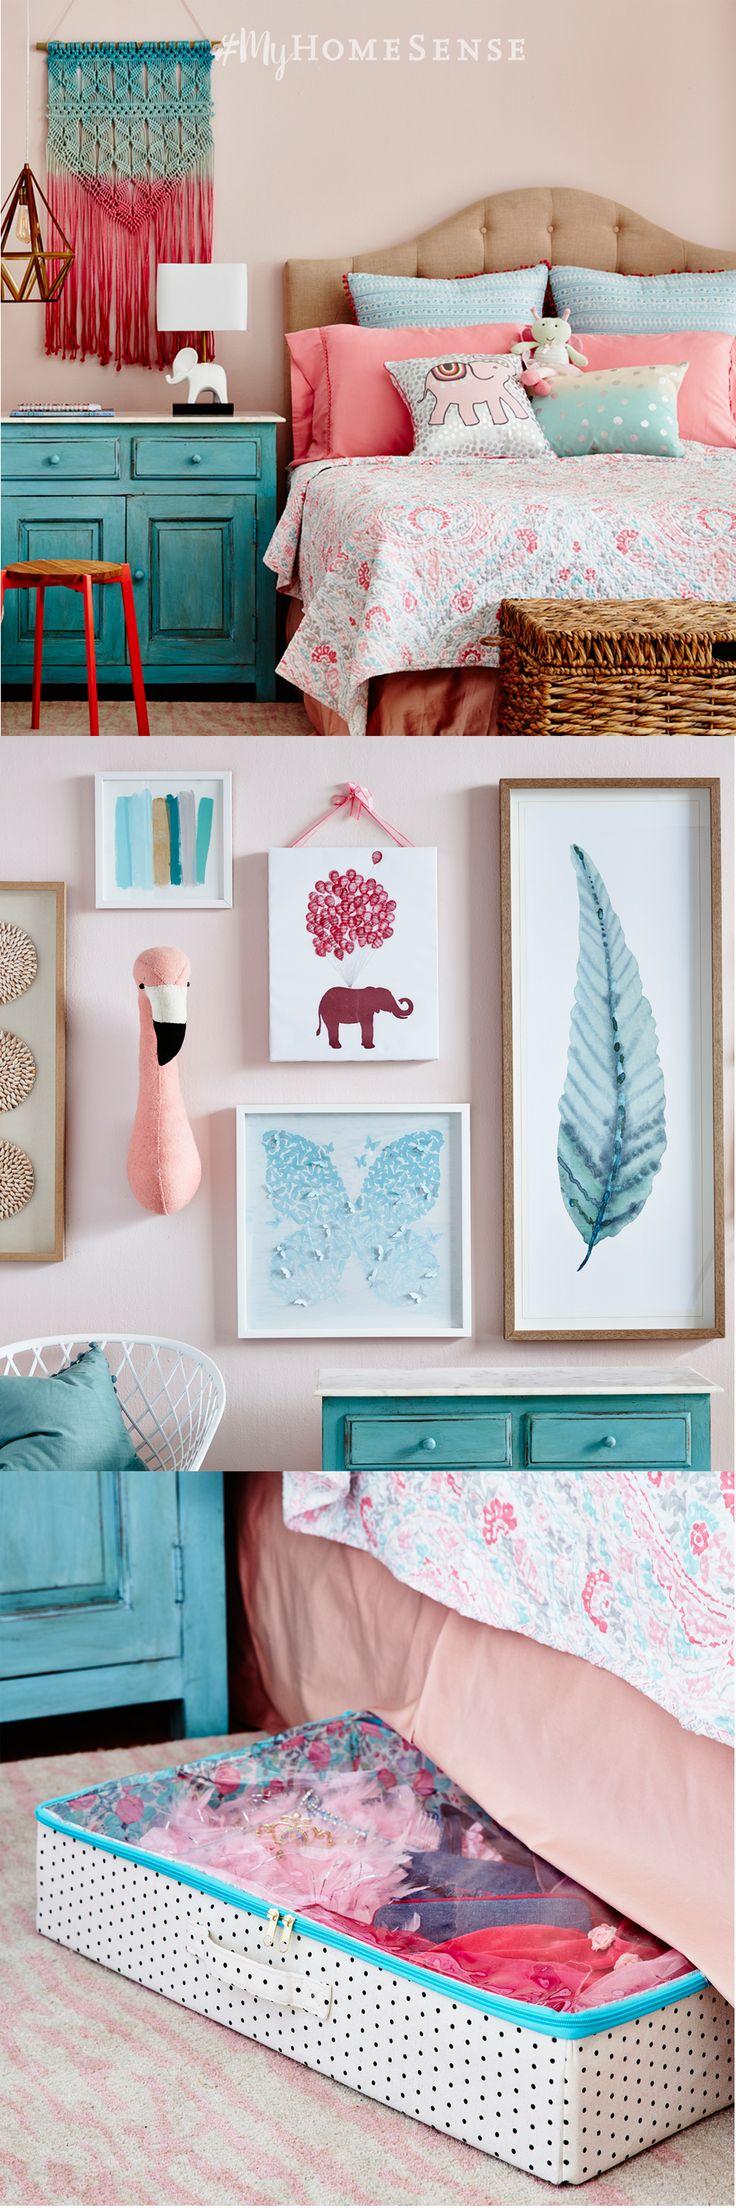 17 Best Ideas About Paint A Dresser On Pinterest